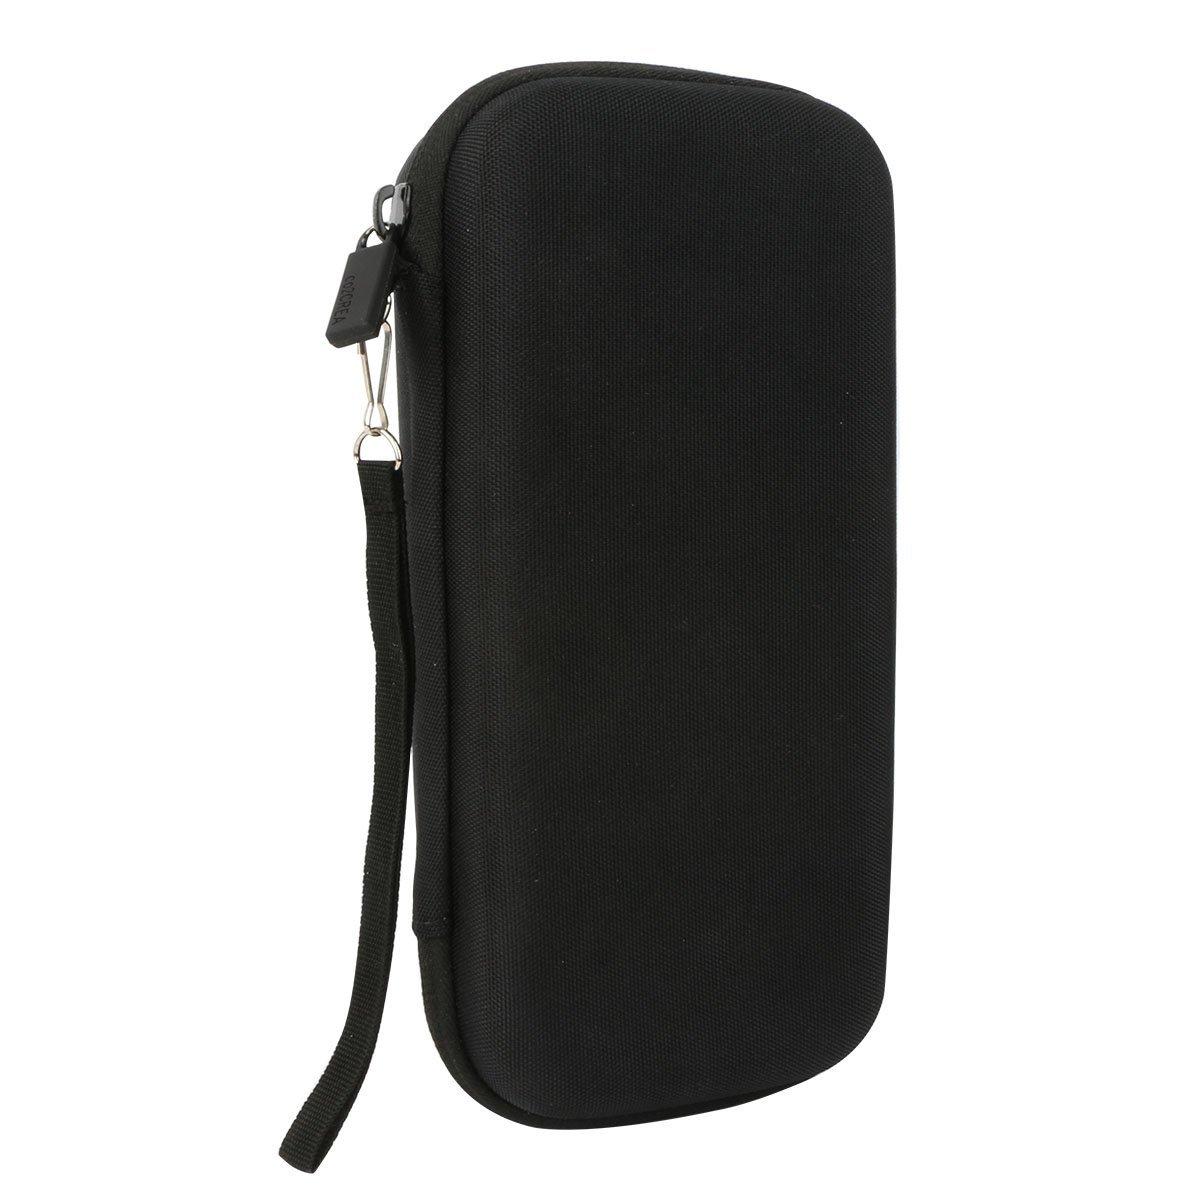 co2CREA Storage Travel Carry Orginzer Case bag for truMedic TENS Unit Electronic Pulse Massager